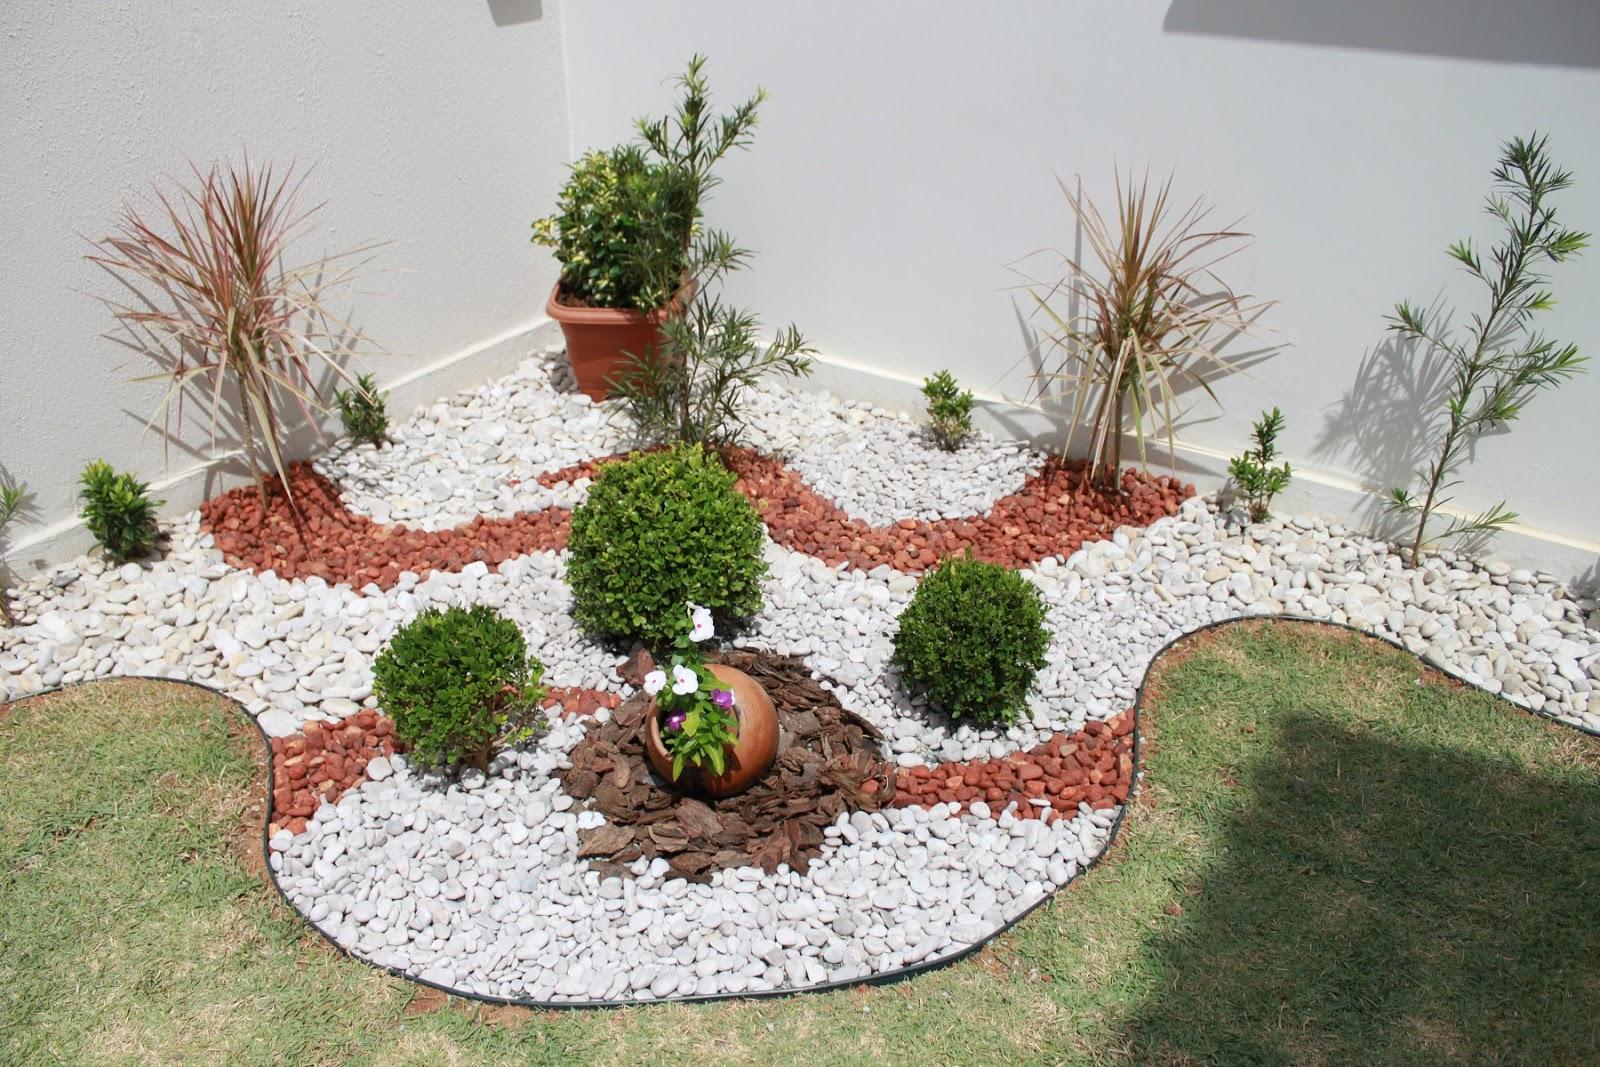 Floricultura e paisagismo ifsert o rural instala o jardim residencial - Separador jardin ...